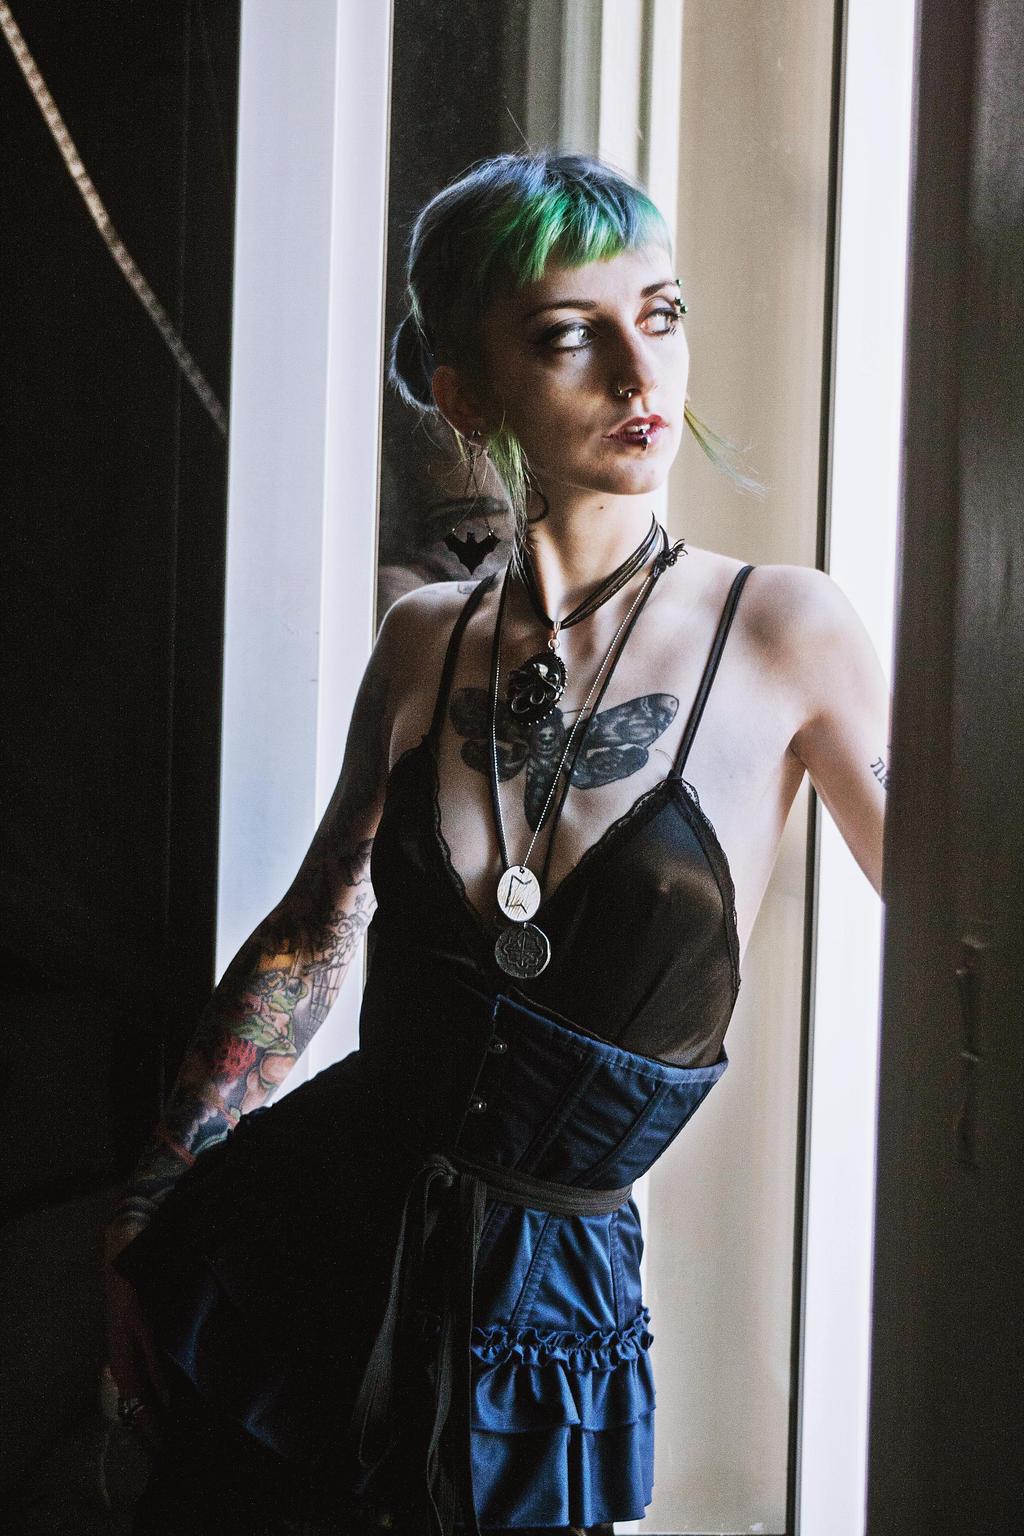 She looks like a bat under the sunshine. by CountessViceosa